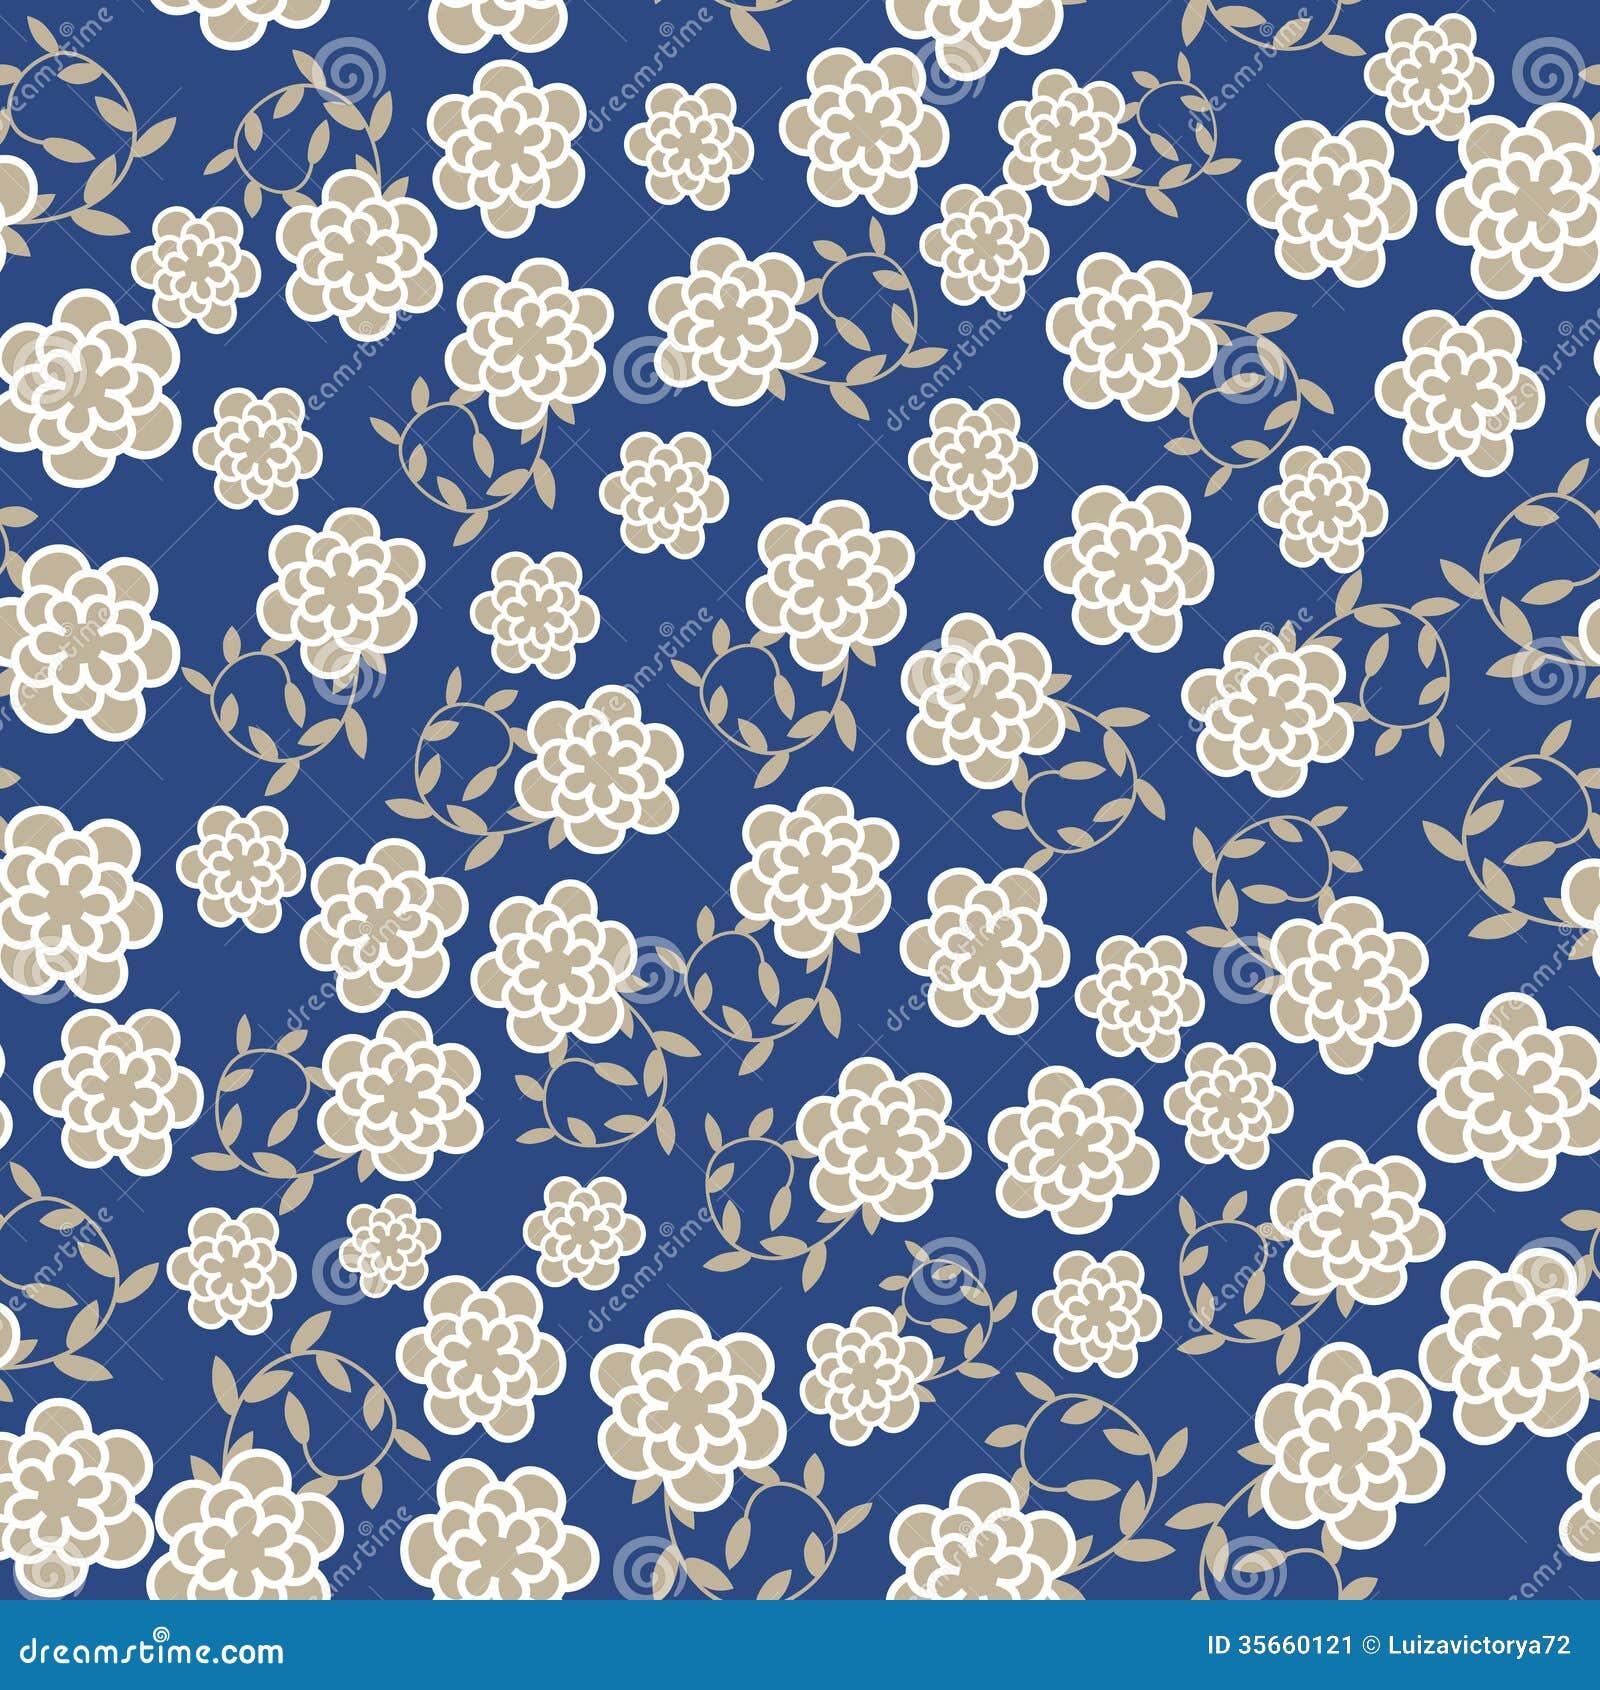 Blue Floral Vintage Wallpaper Floral vector seamless pattern